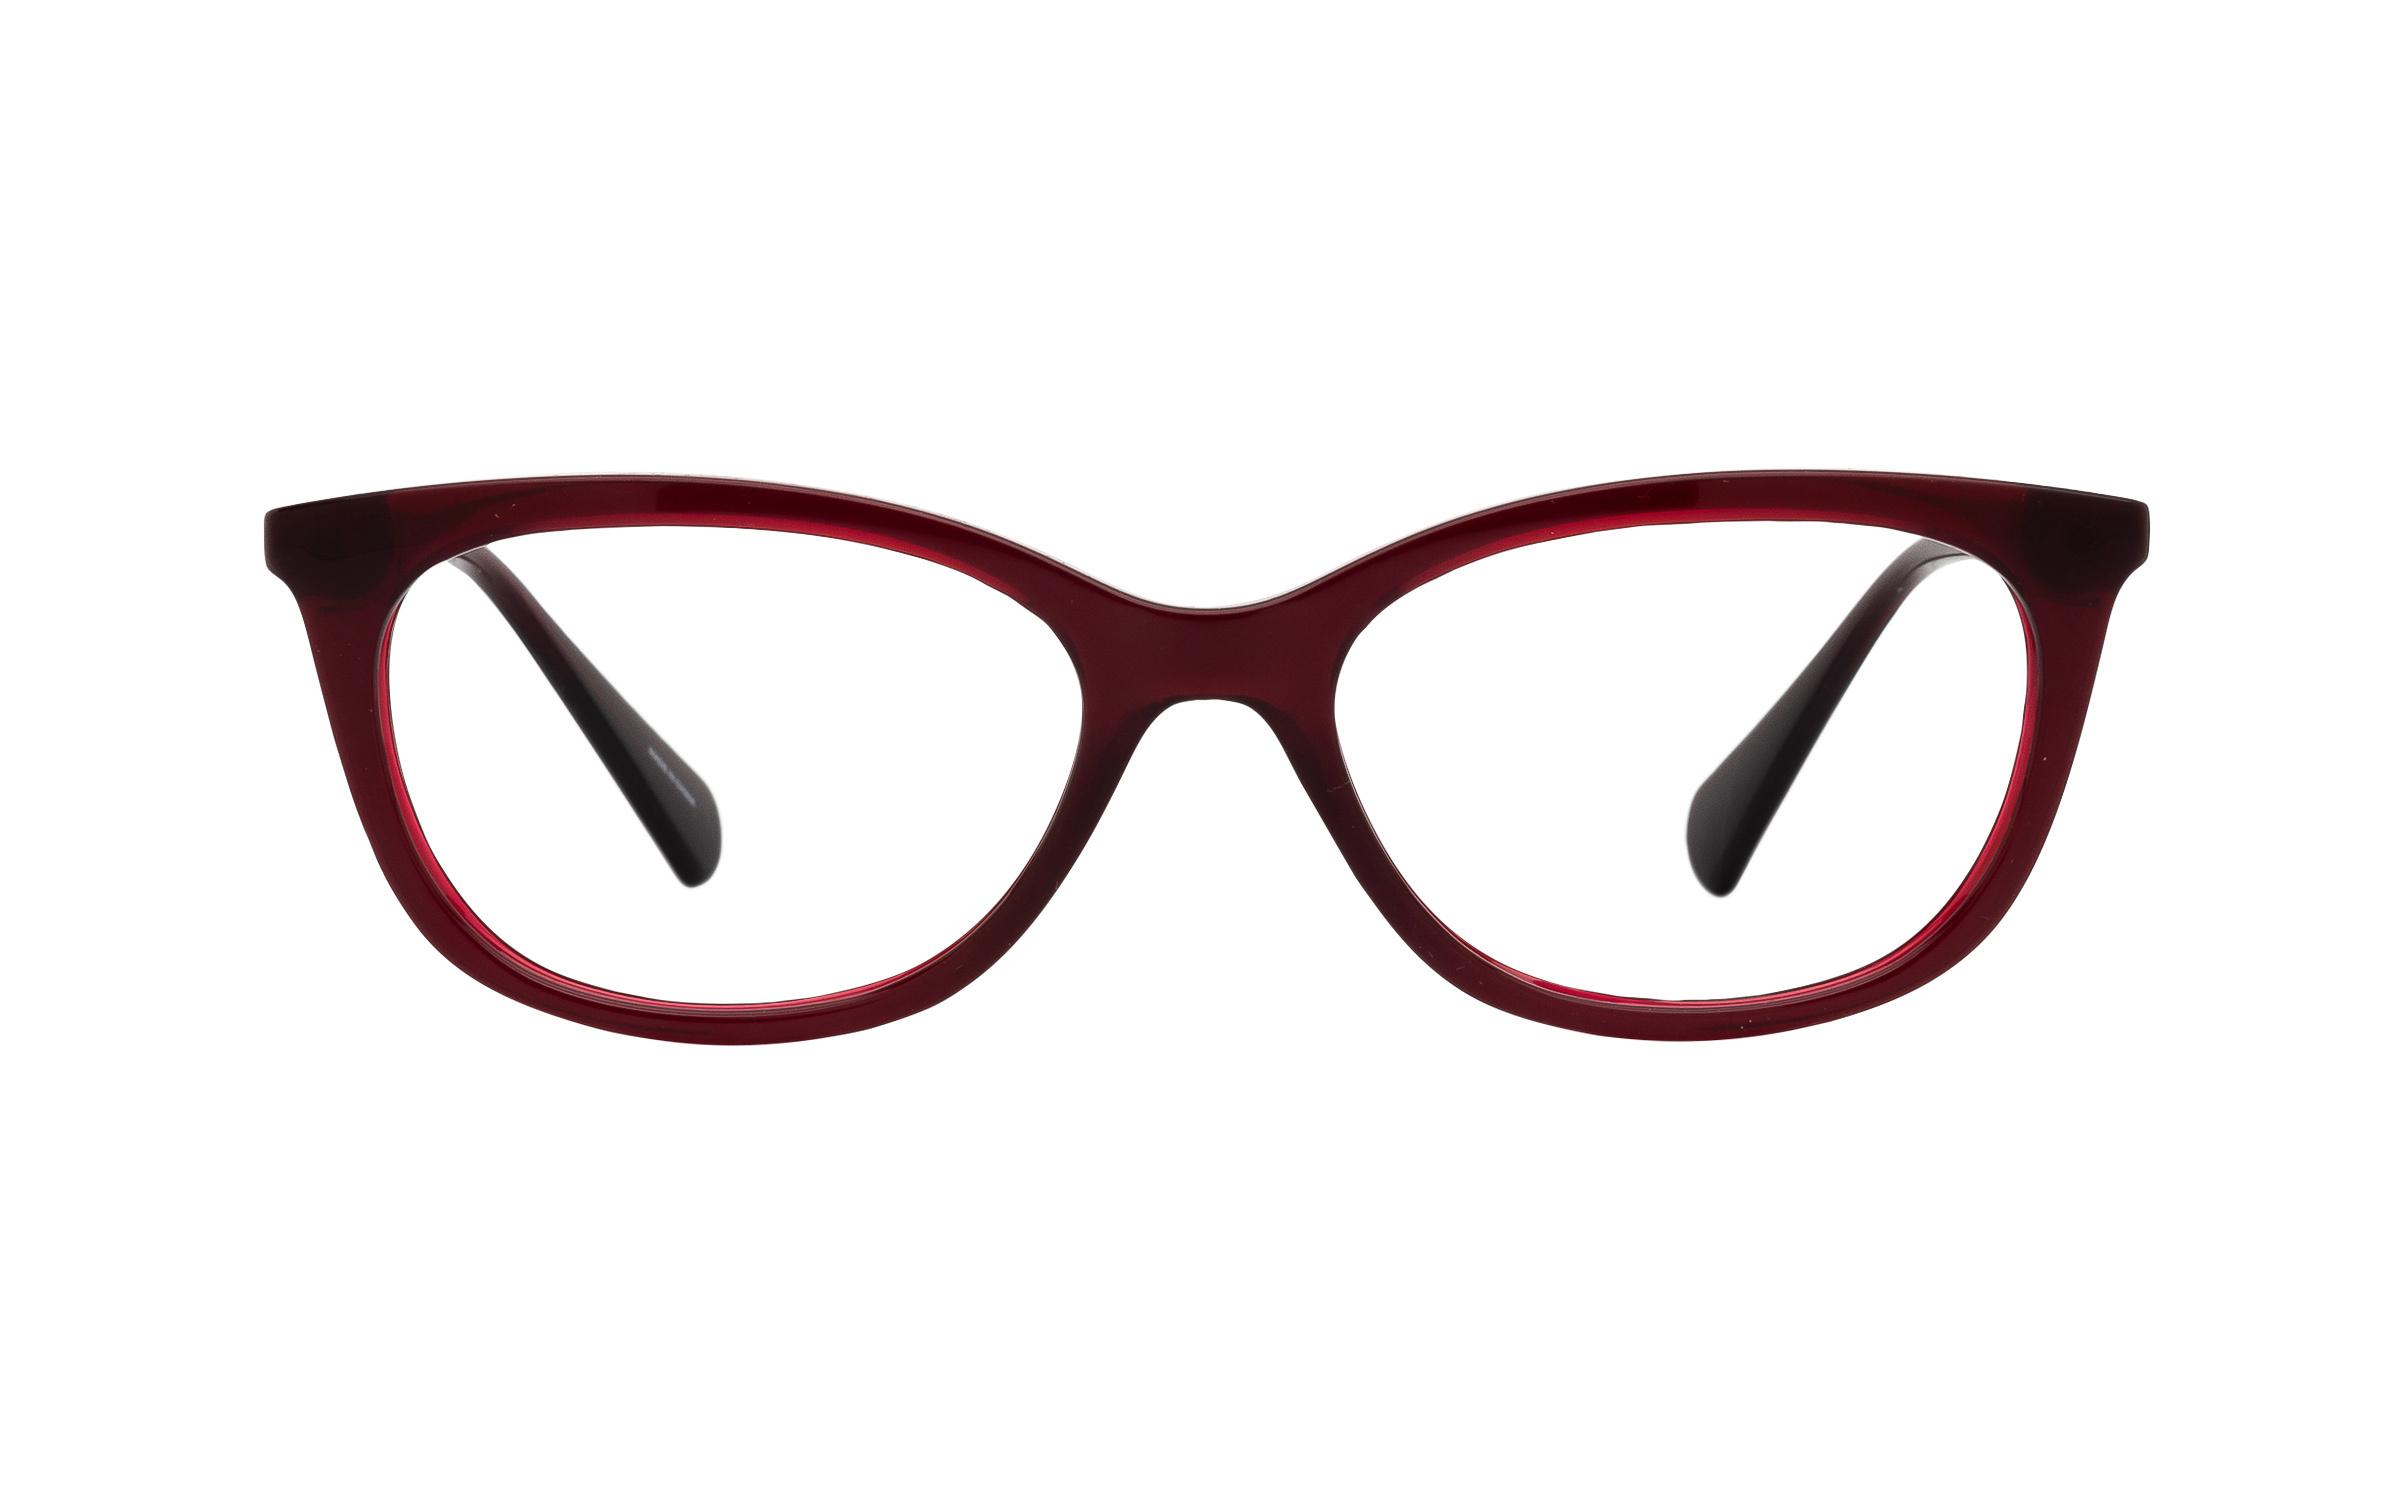 coastal.com - Ralph by Ralph Lauren 0RA7085 1674 (51) Eyeglasses and Frame in Burgundy Red | Acetate – Online Coastal 154.00 USD